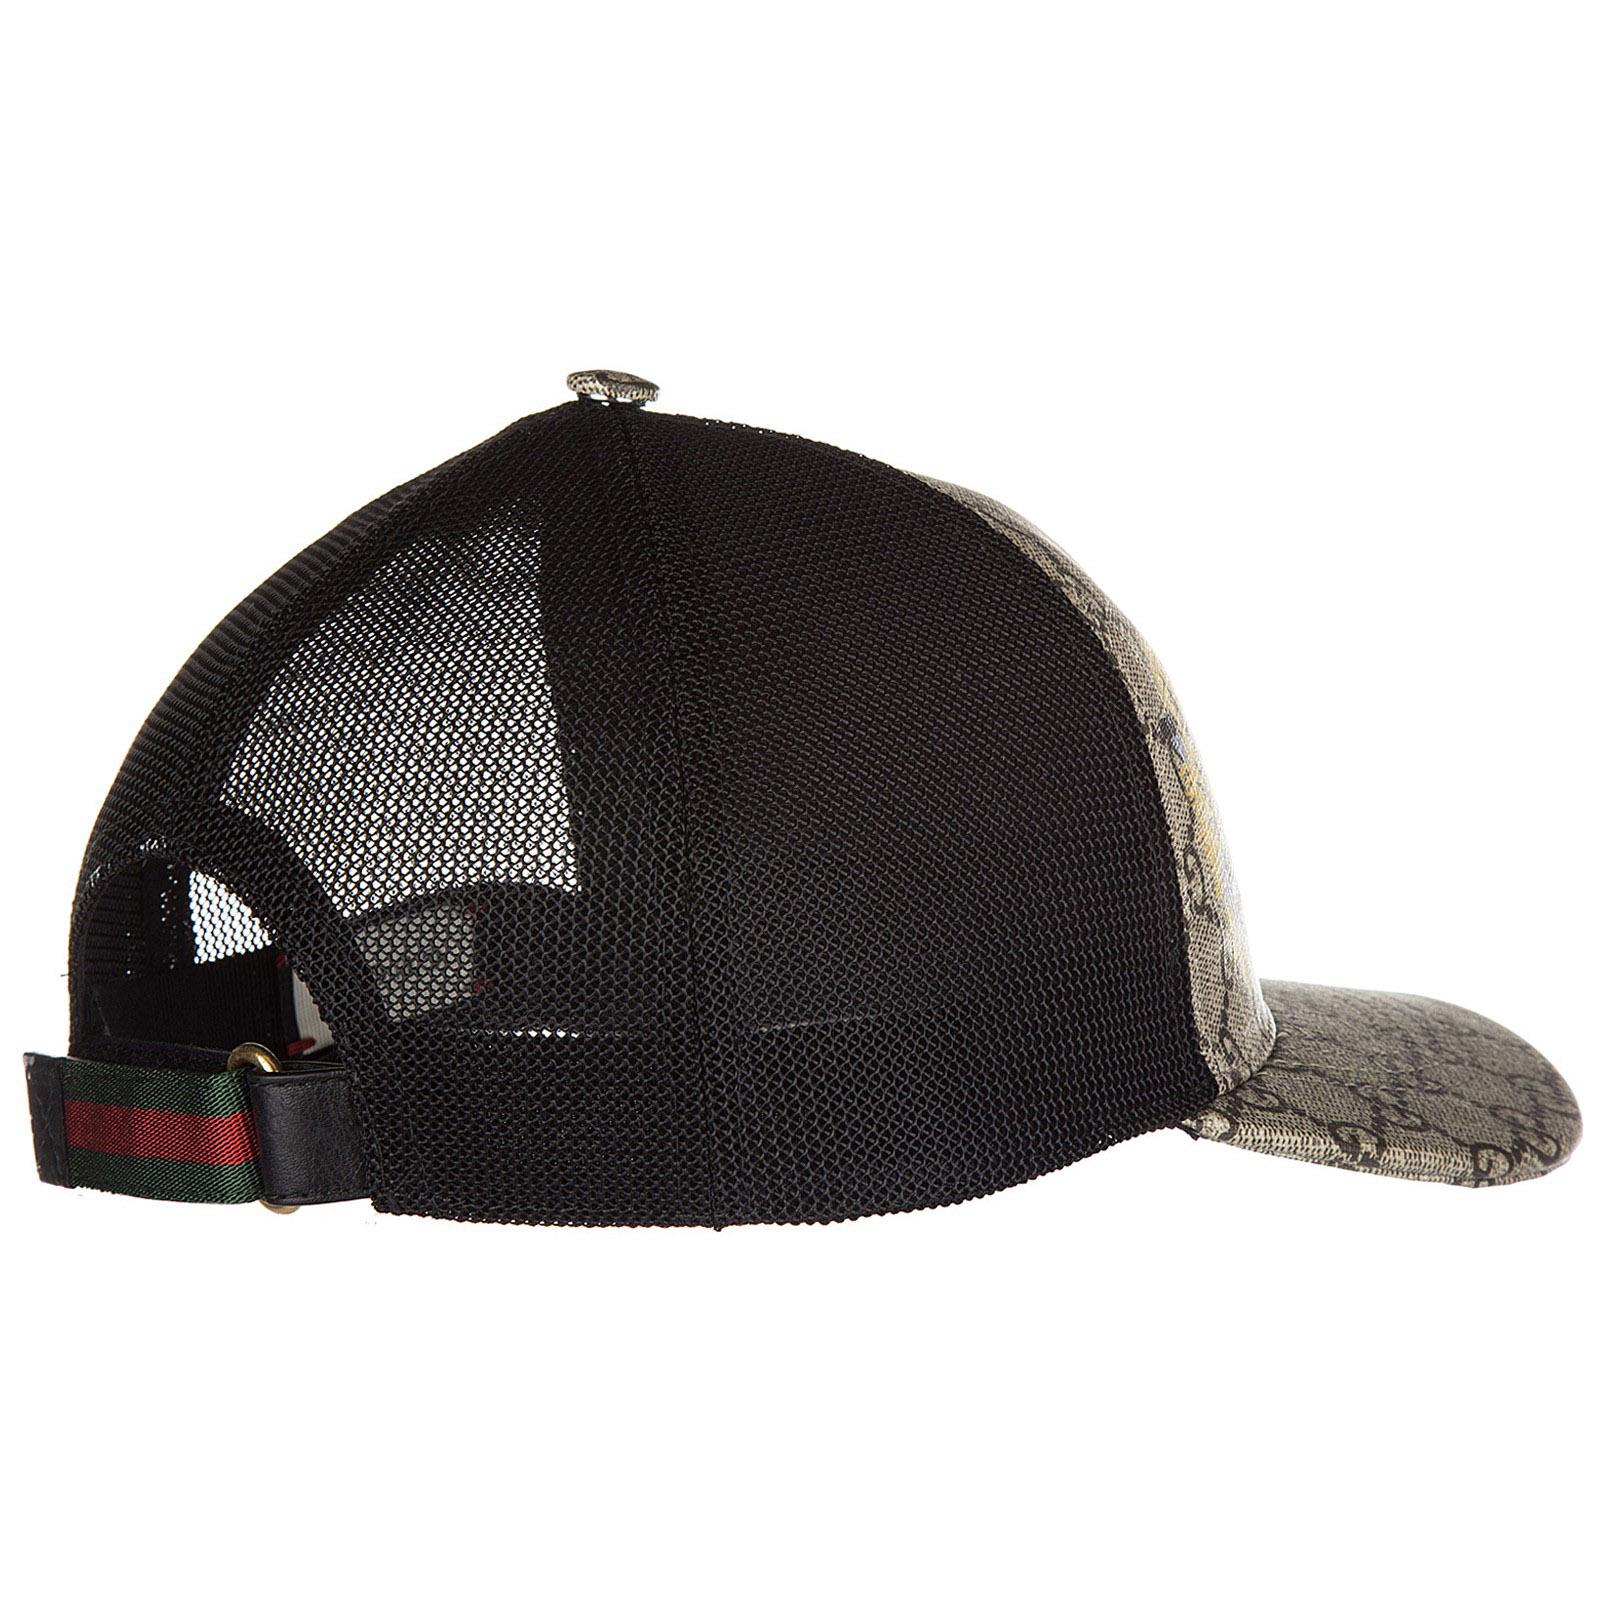 ... Adjustable men s cotton hat baseball cap bengal tiger ... fd52c783133